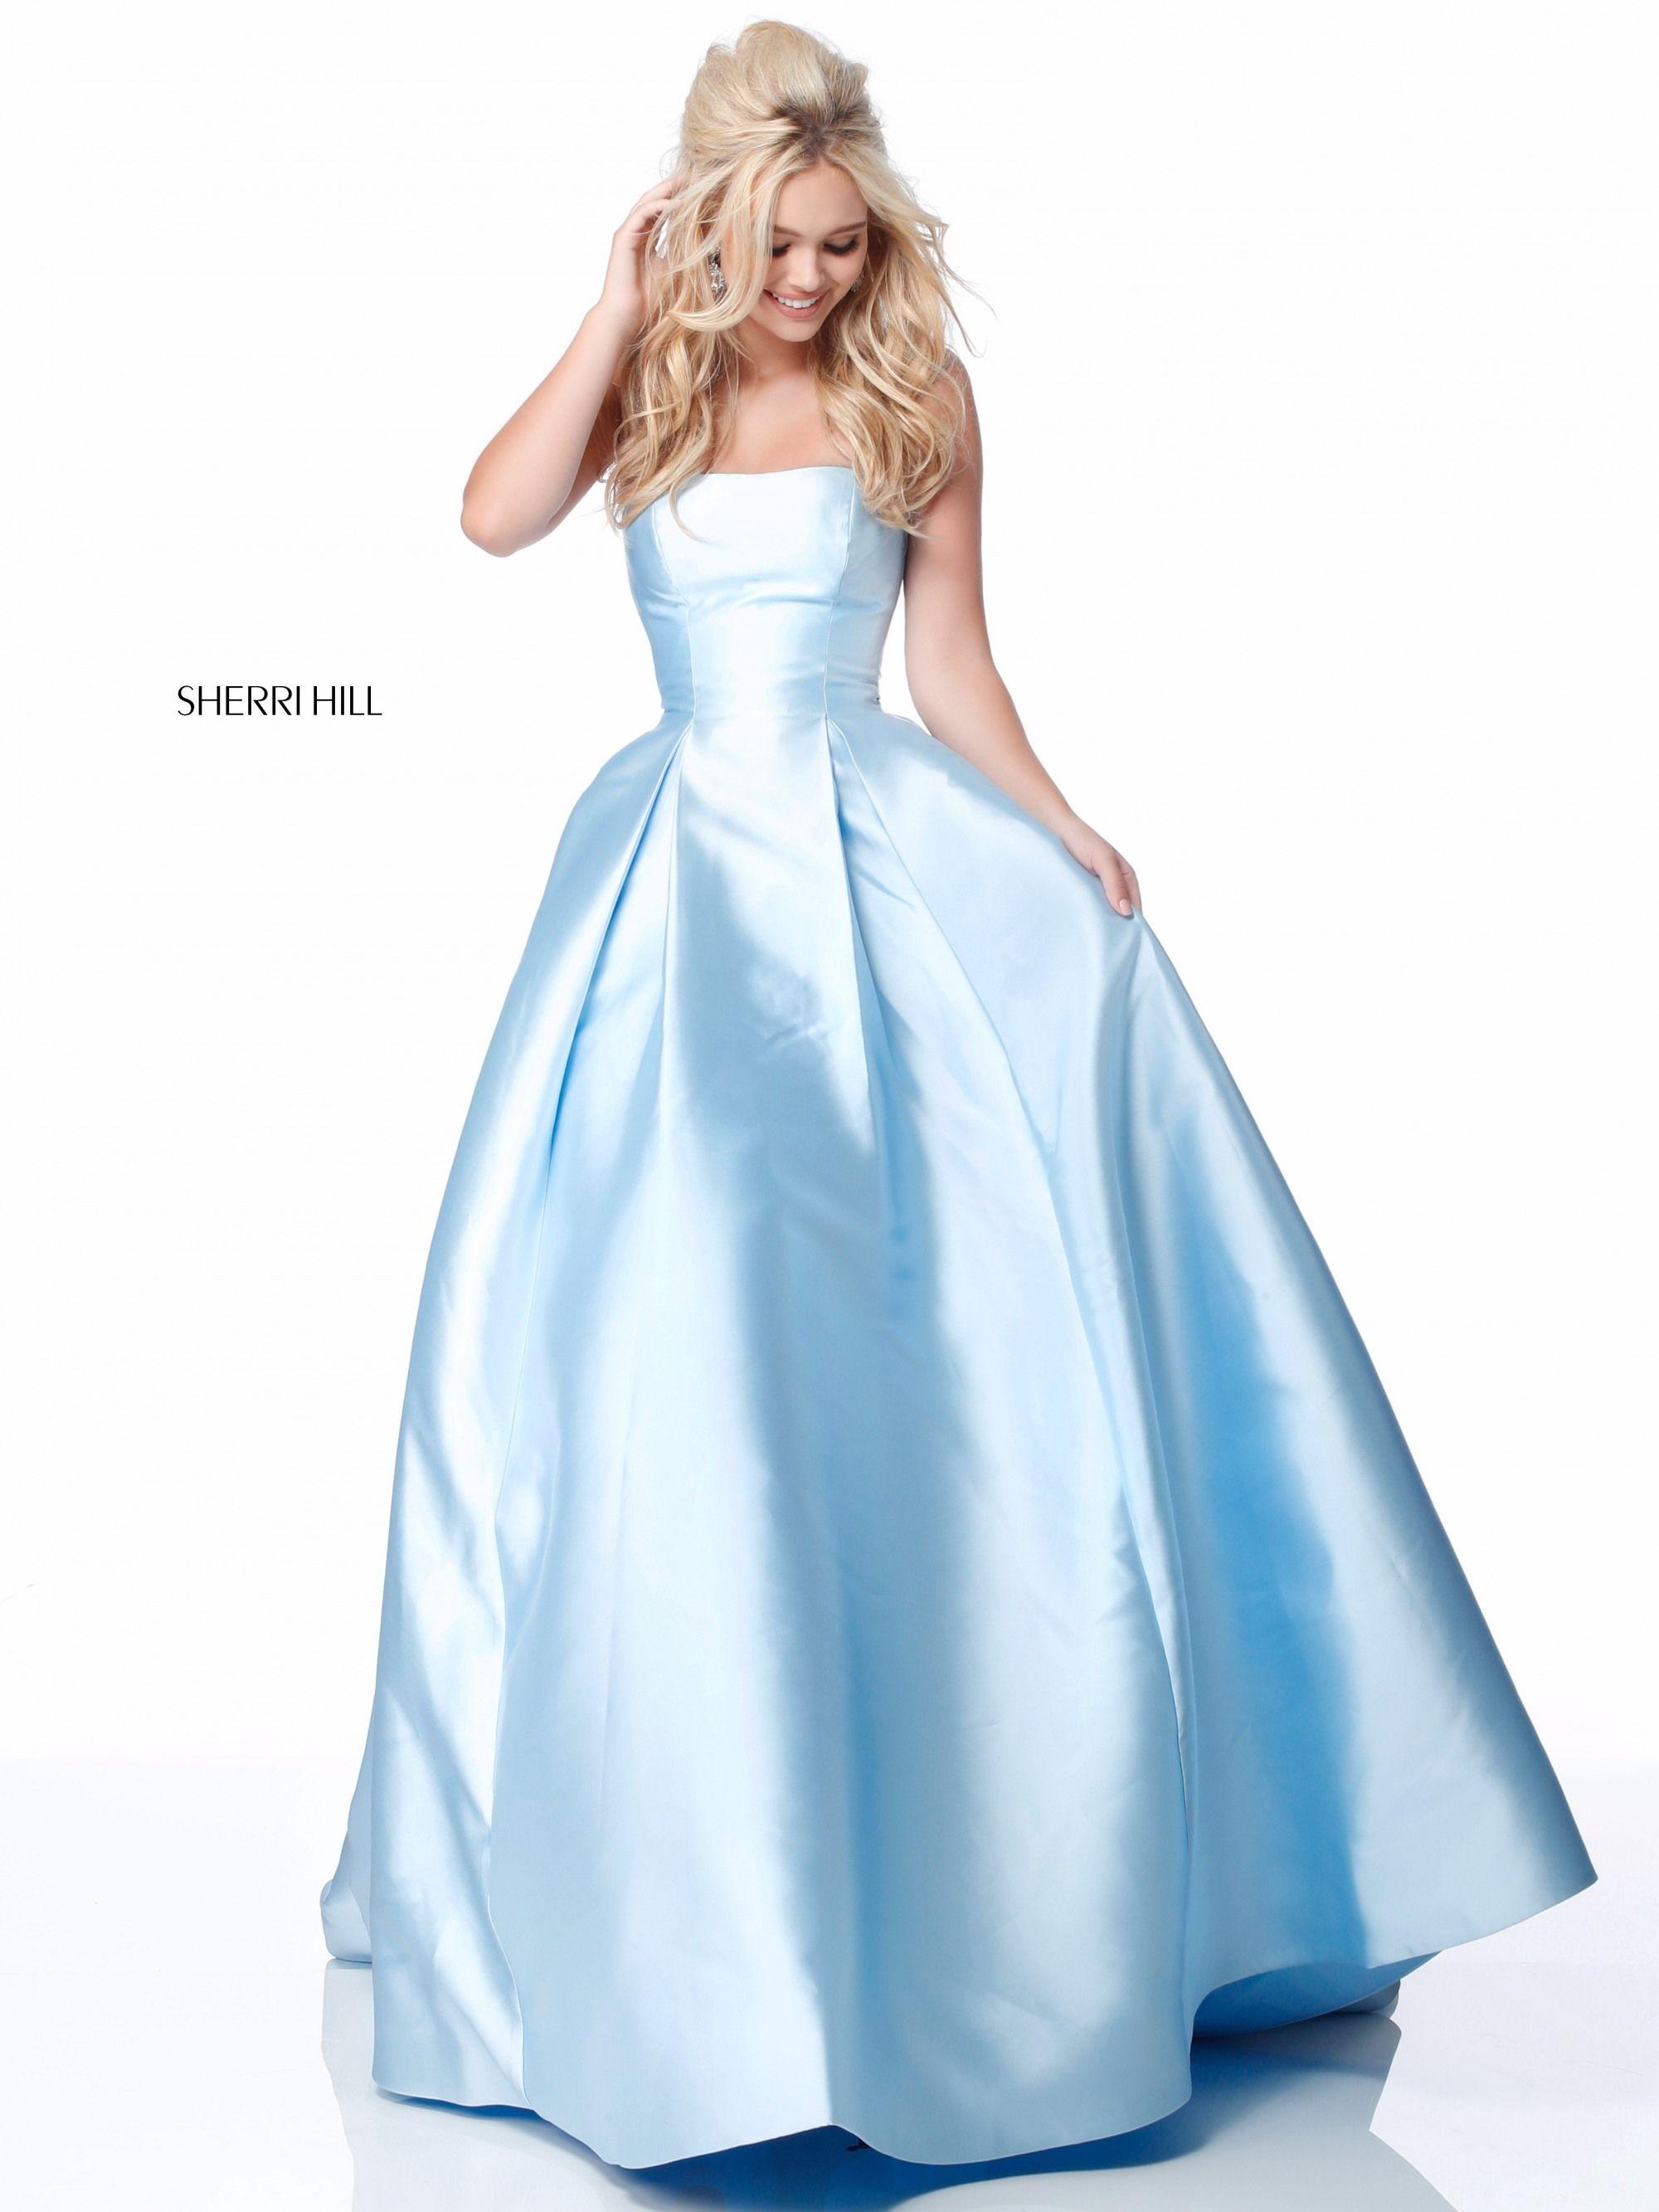 Sherri hill strapless prom dress in fashion pinterest